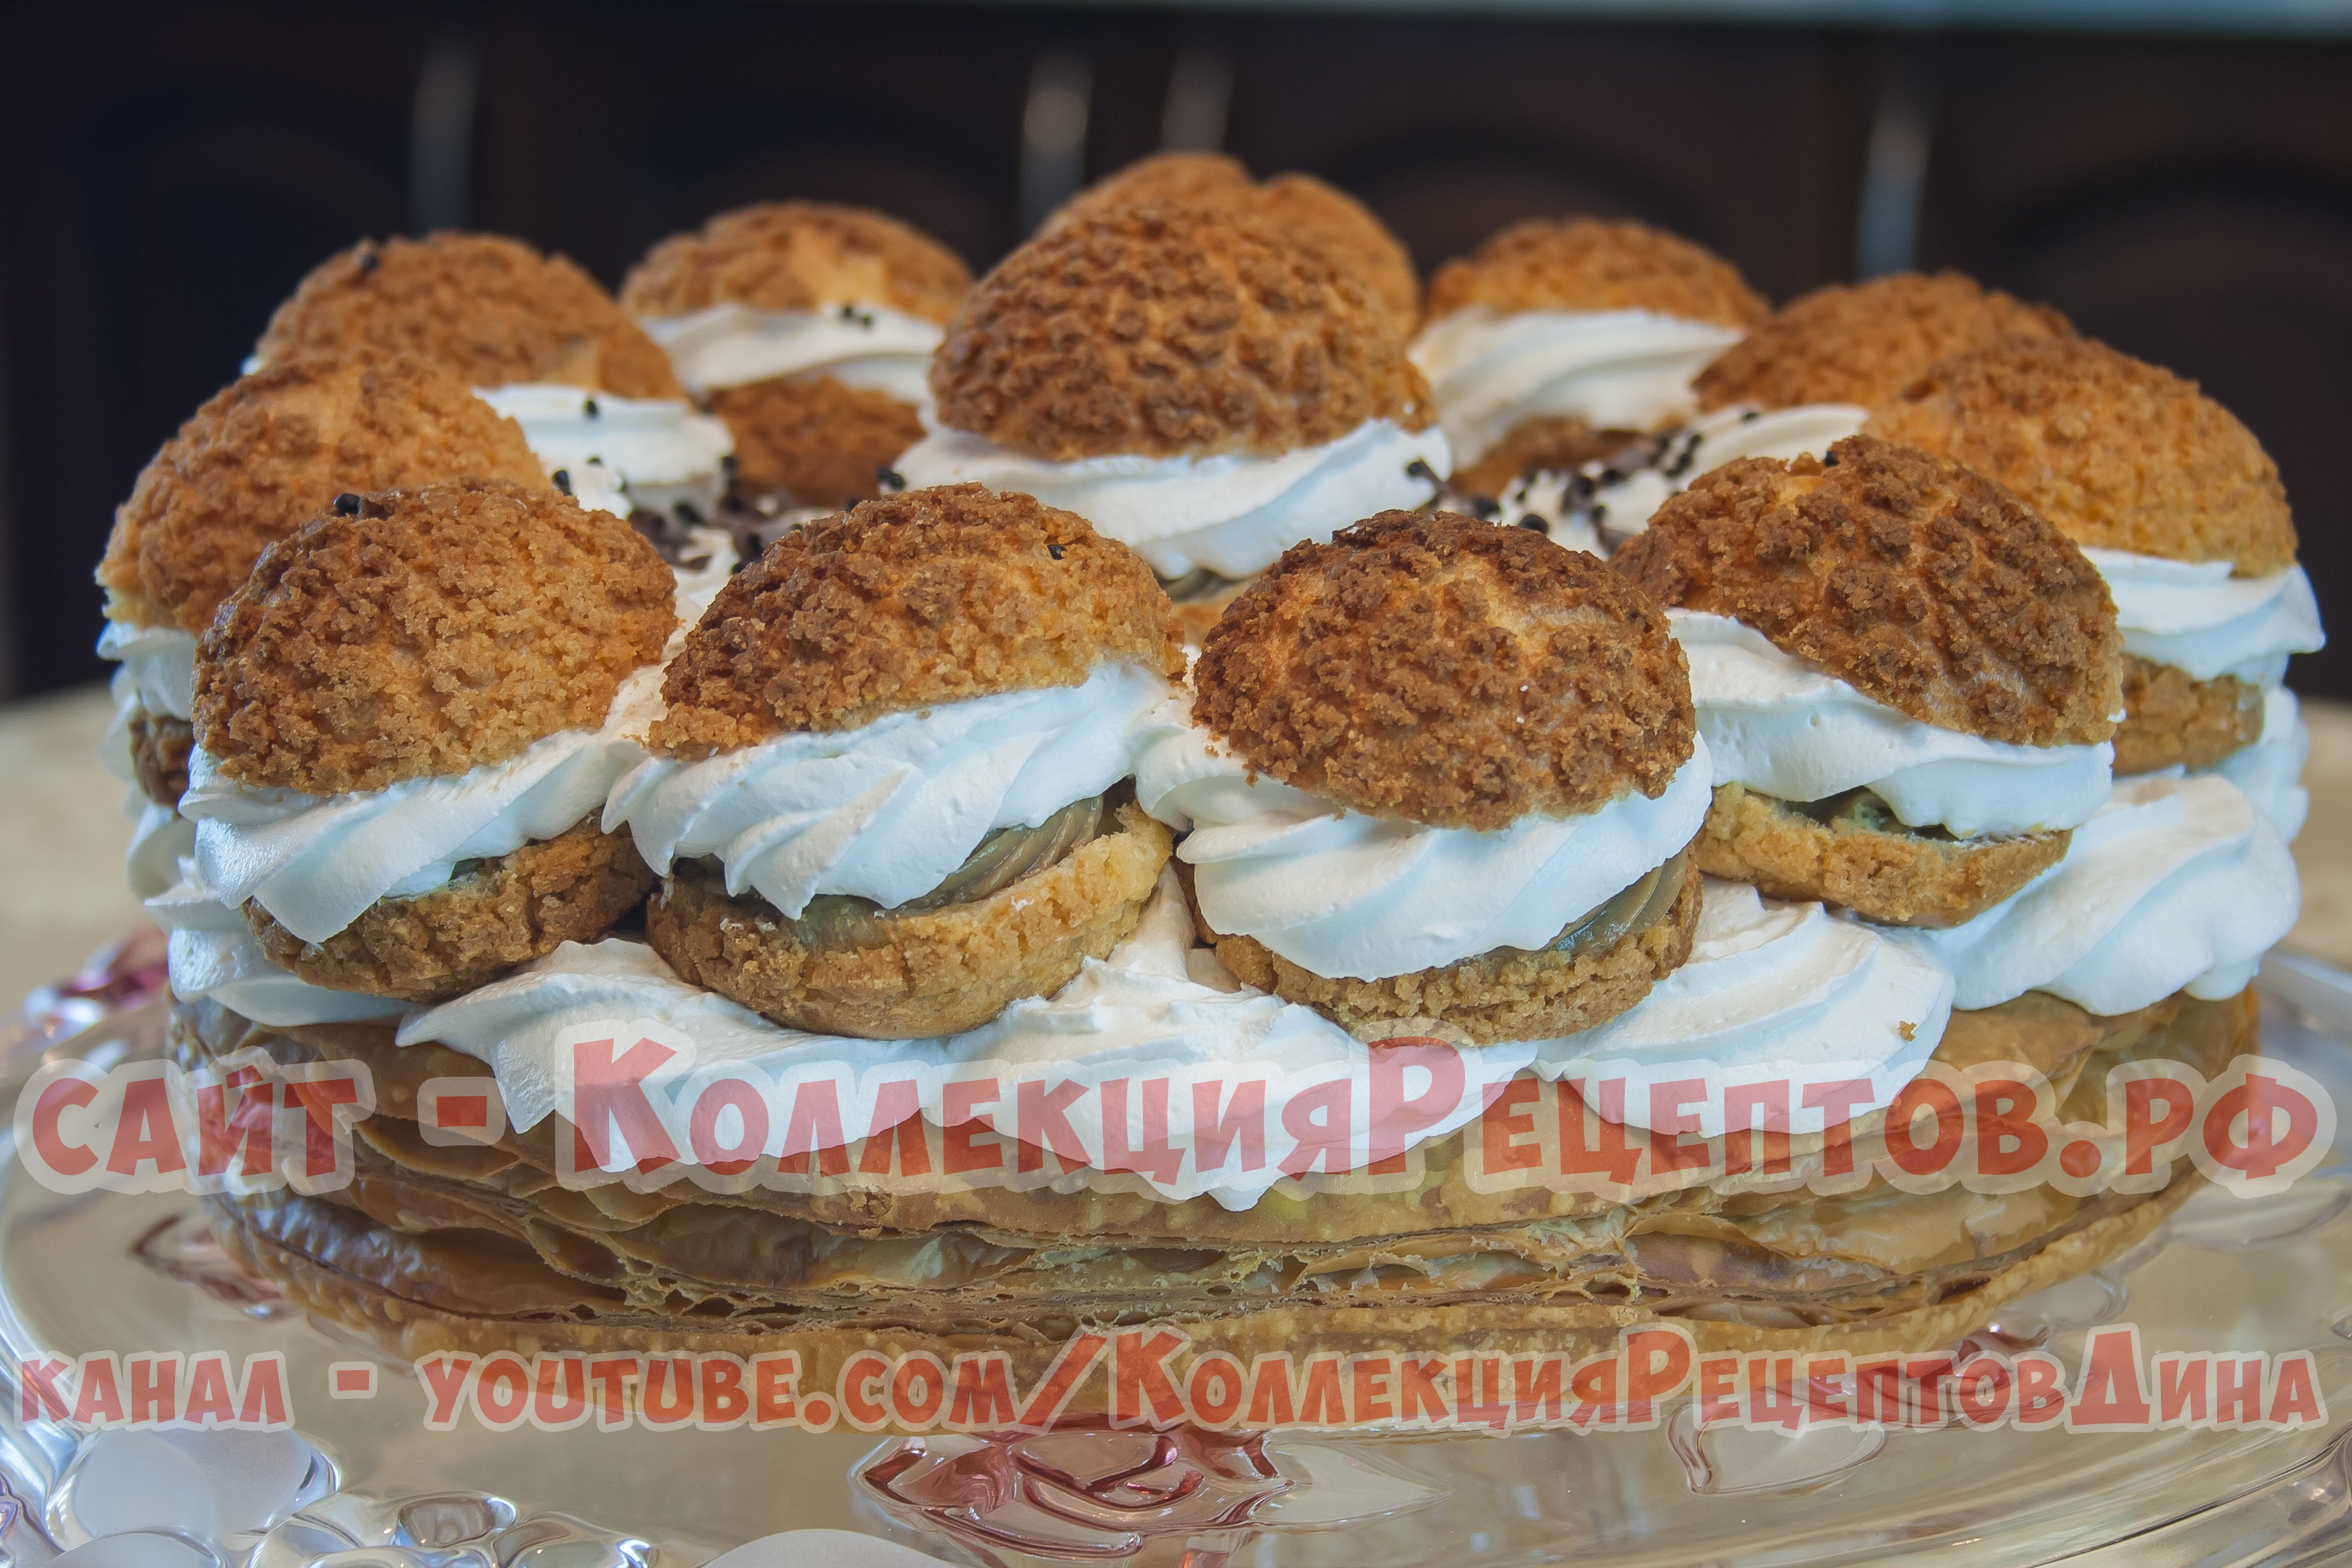 Торт Сент Оноре: рецепт с фото на Все о десертах 93